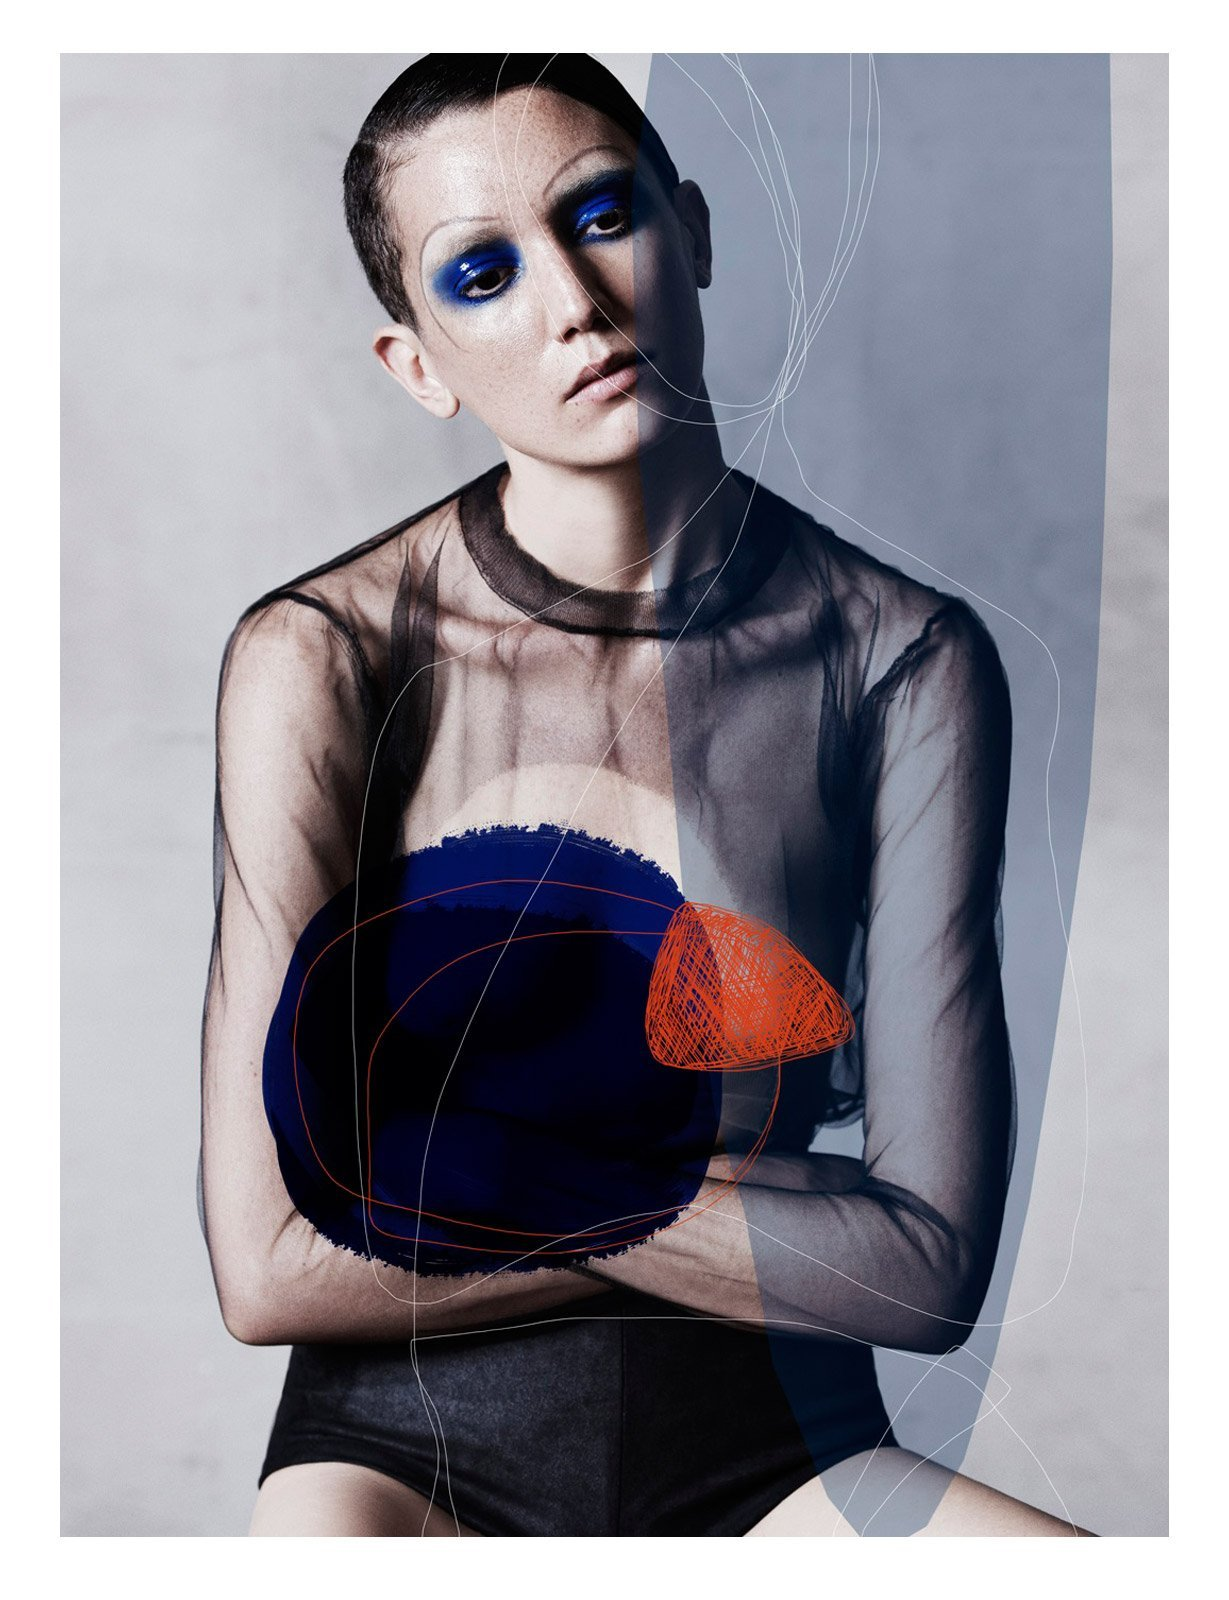 ignant-photo-lea-nielsen-fashion-photography-10